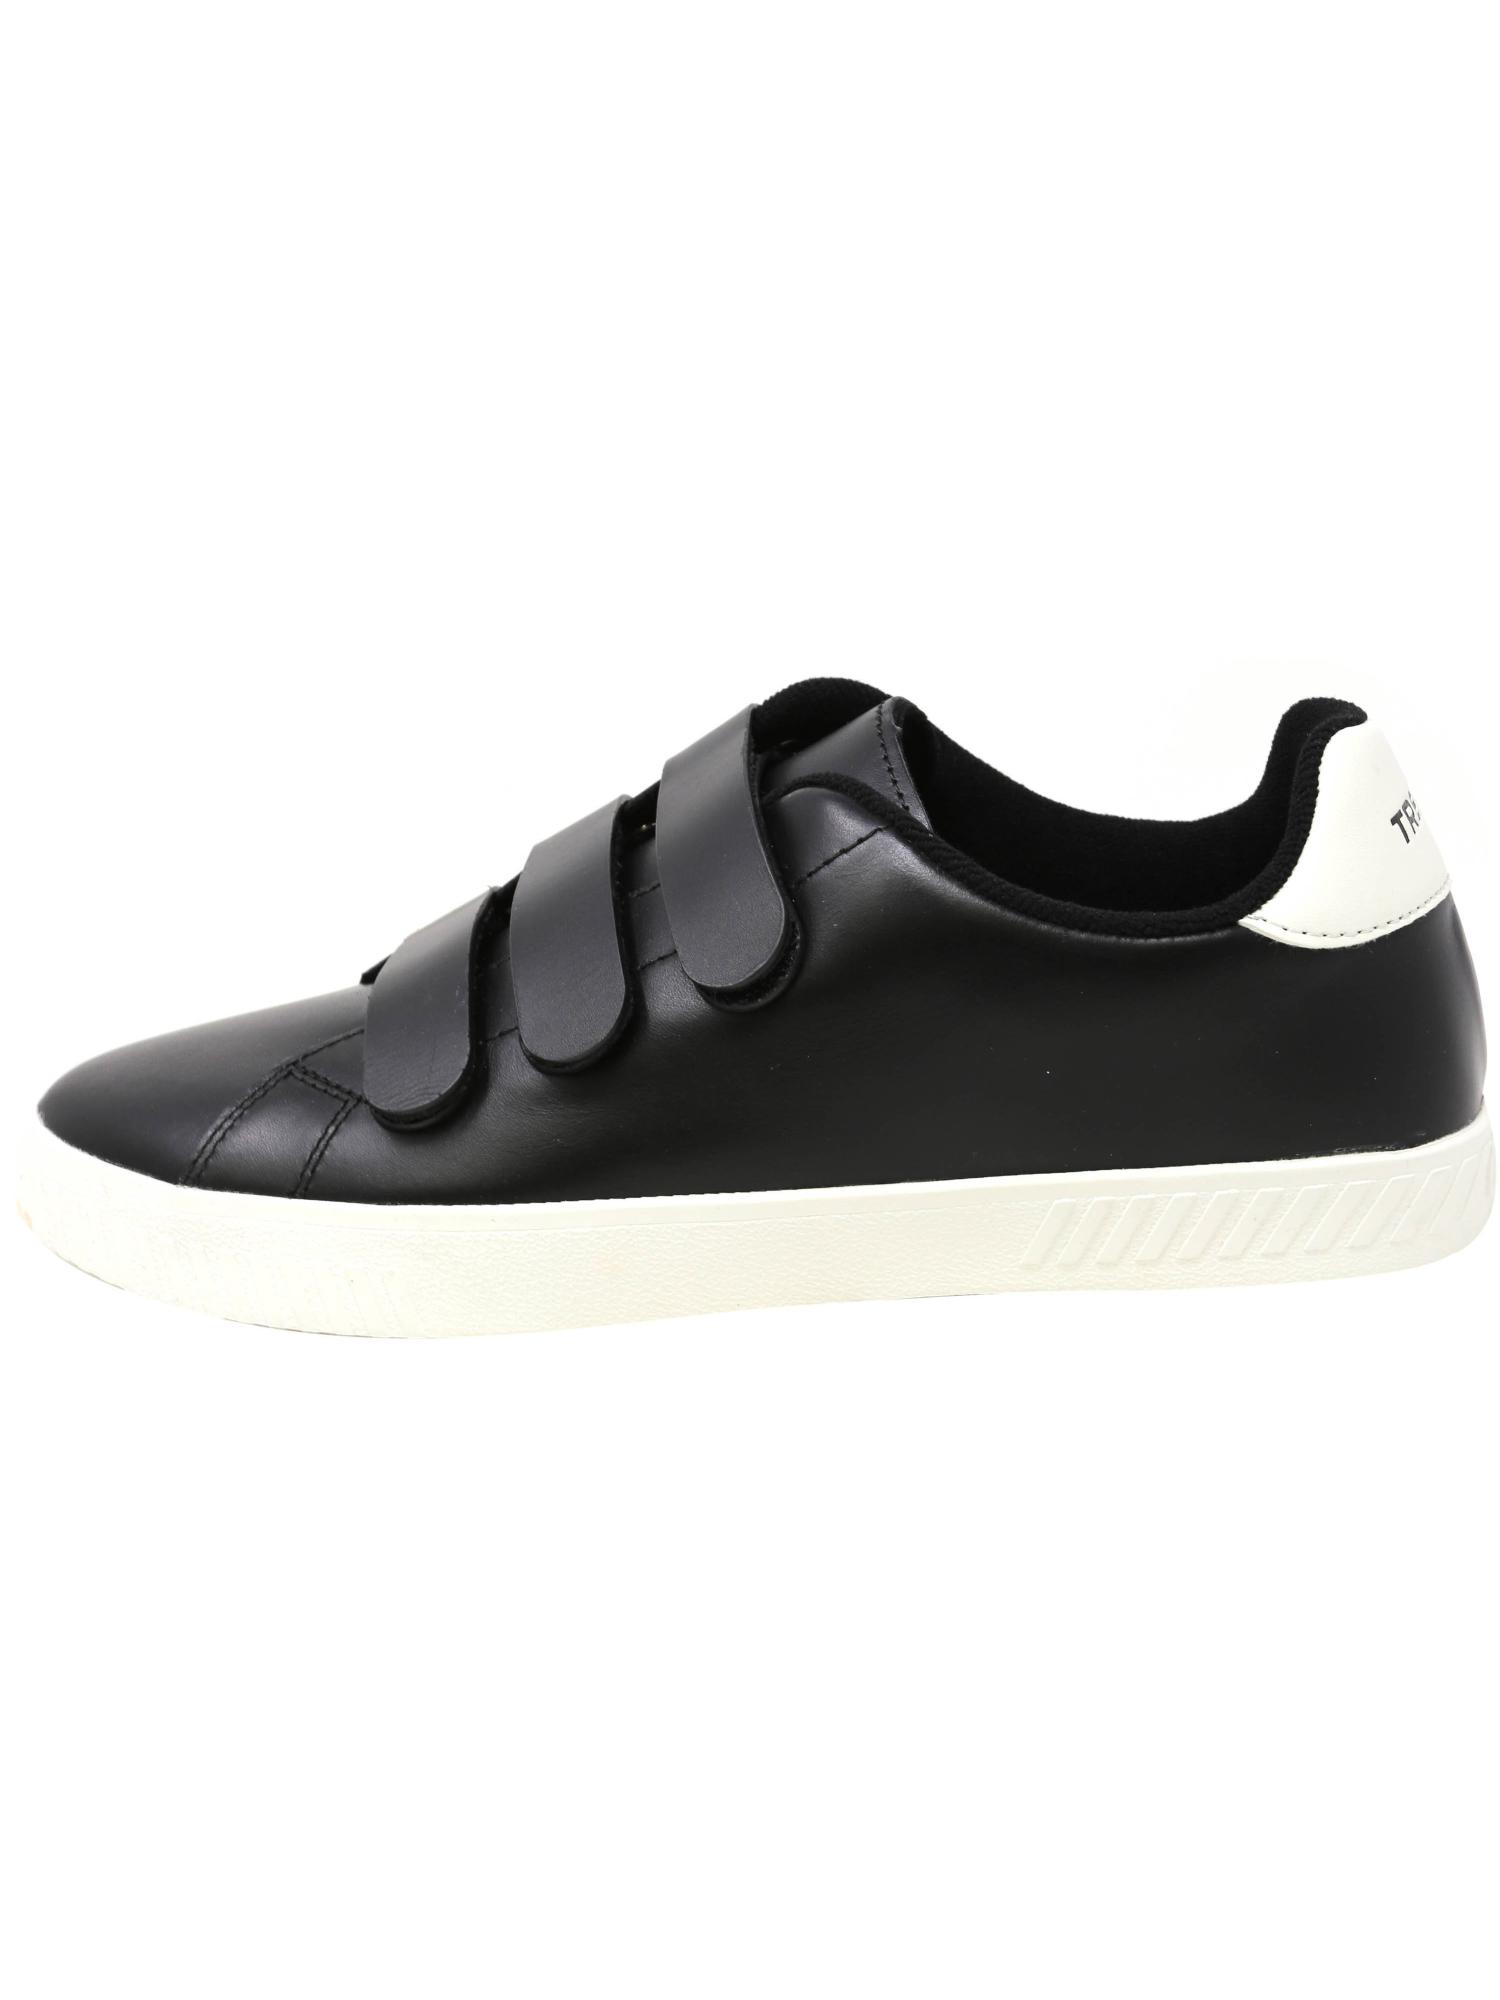 Homme-Tretorn-Transporter-2-en-Cuir-Cheville-High-Fashion-Sneaker miniature 5